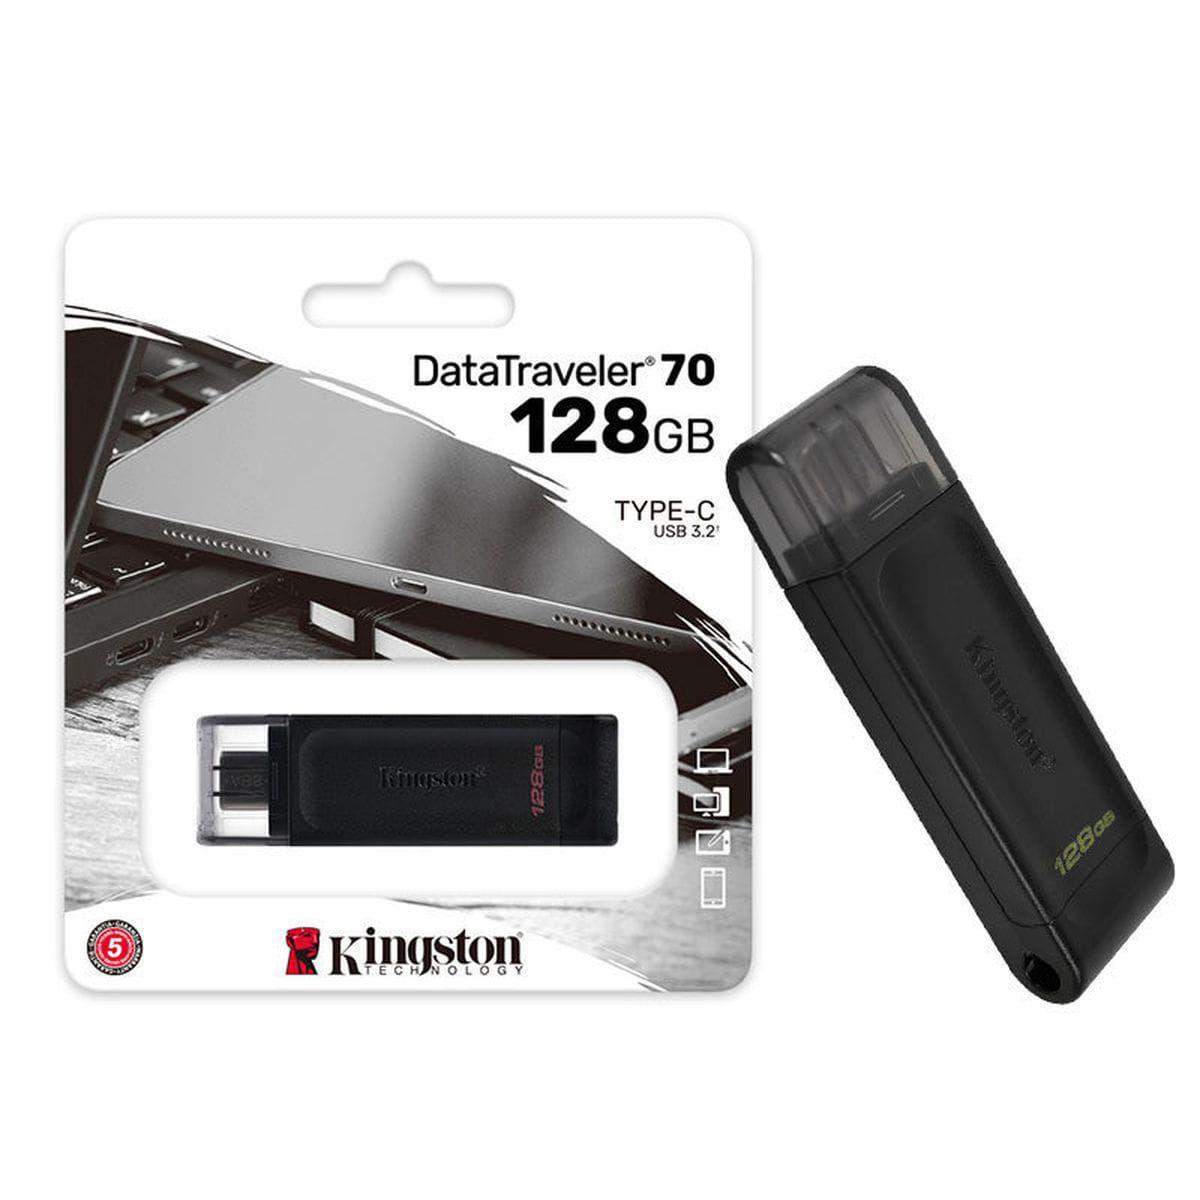 Pen Drive USB 3.2 DT70-128GB Datatraveler 70 128GB USB-C 3.2 GEN 1 - Kingston